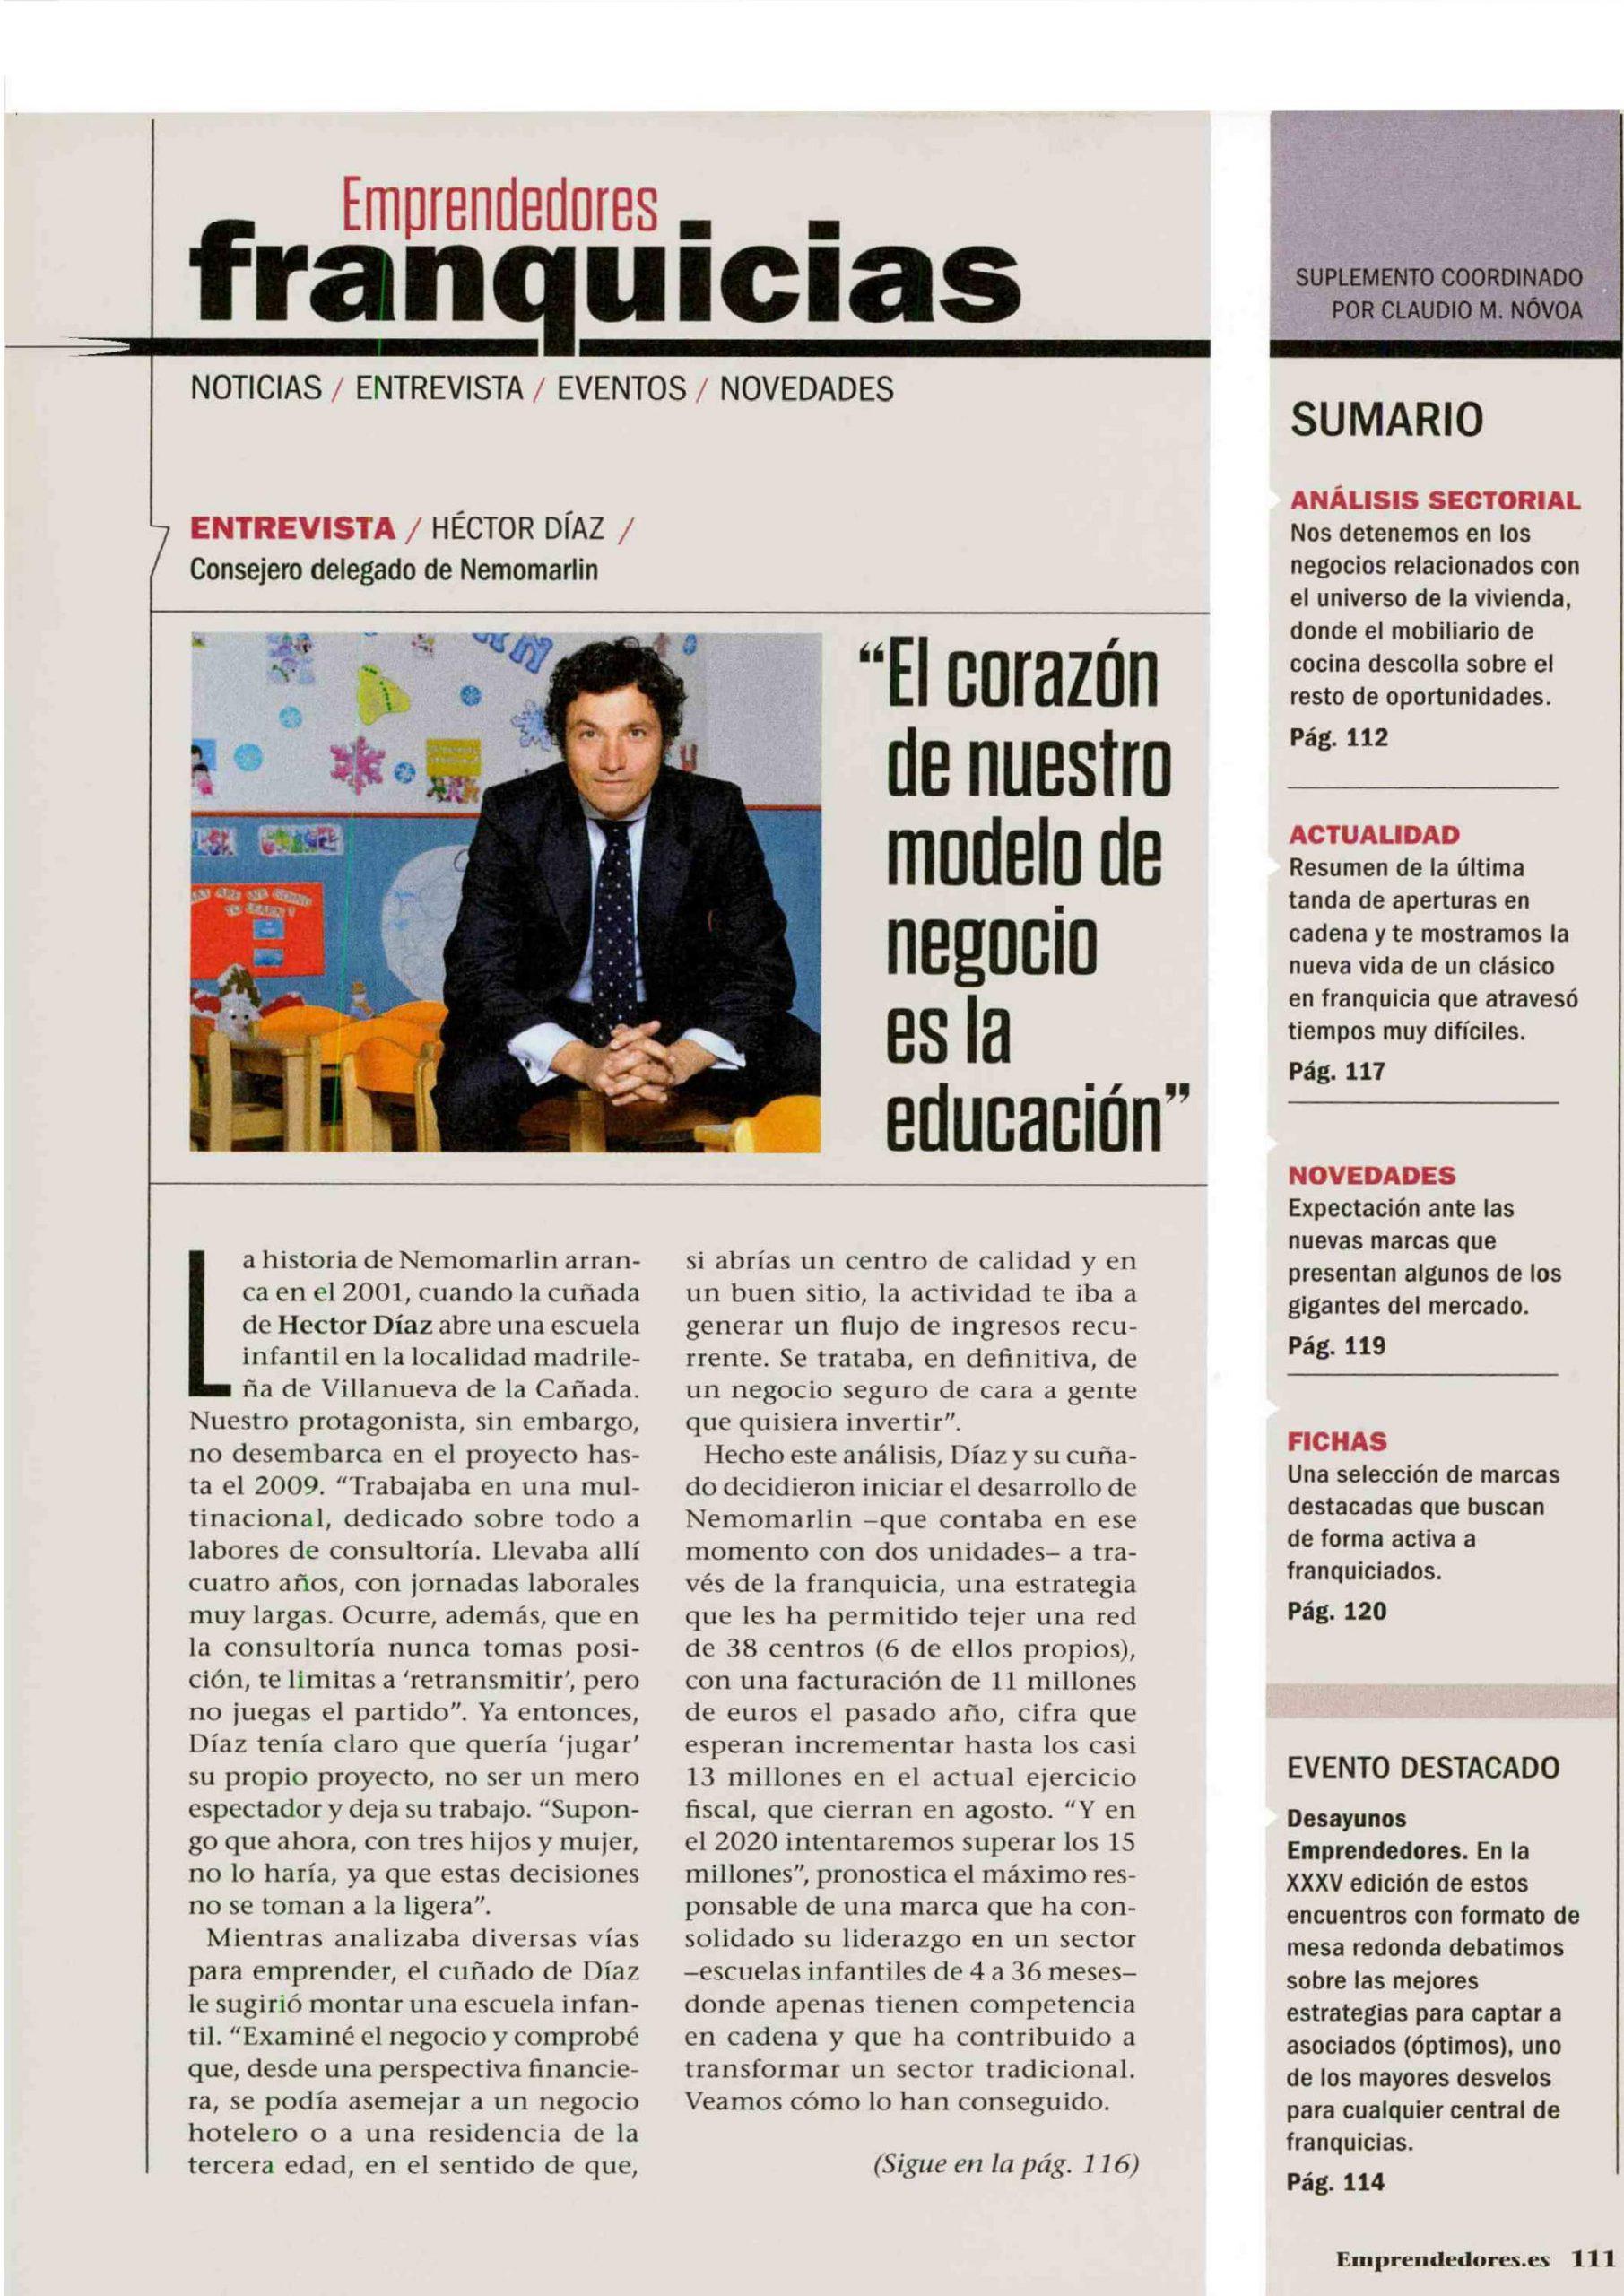 Entrevista Nemomarlin mayo 2019 revista emprendedores 1